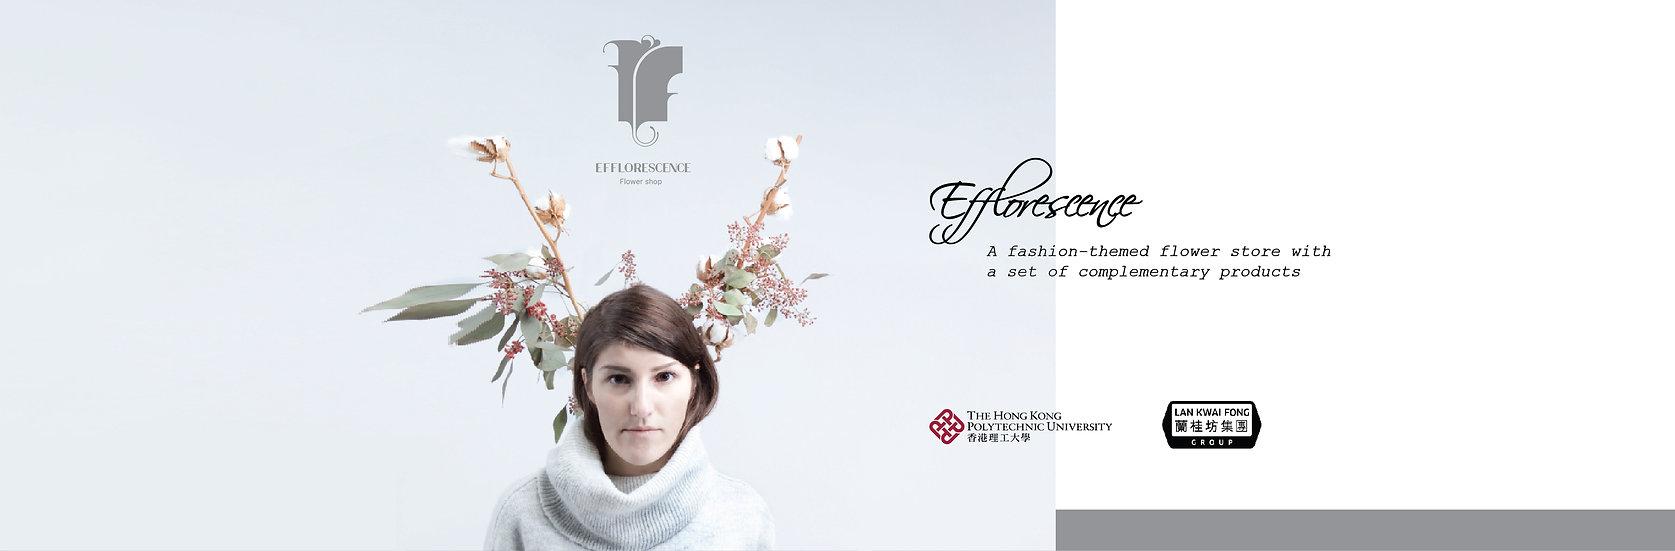 Web Efflorescence-01.jpg